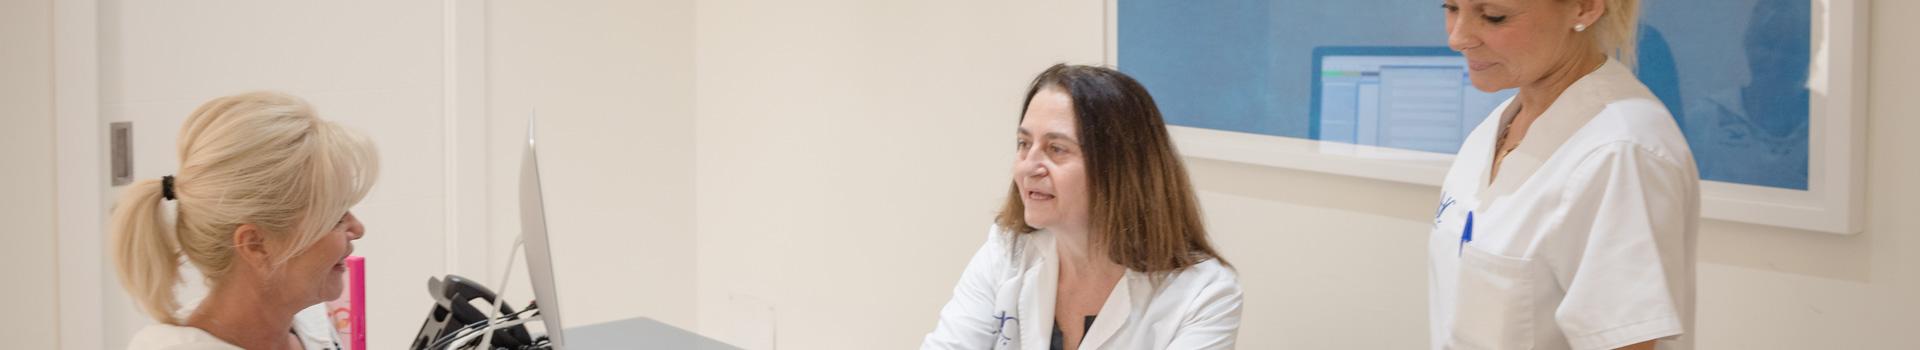 Consulta ginecología Marbella